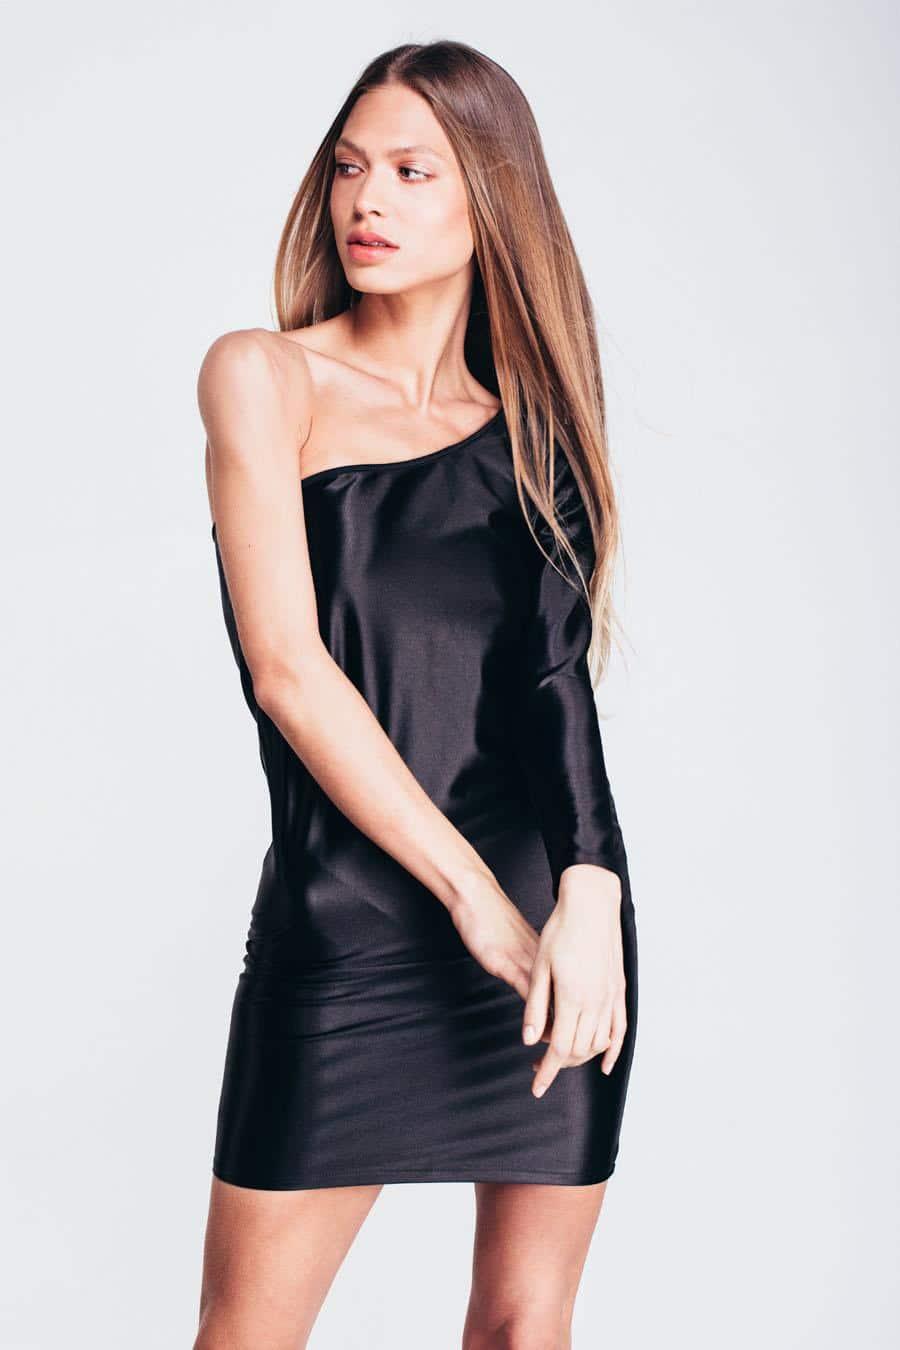 jagger zenska haljina kolekcija prolece leto 2021 ss 2021 kupi online jg 5515 01 4